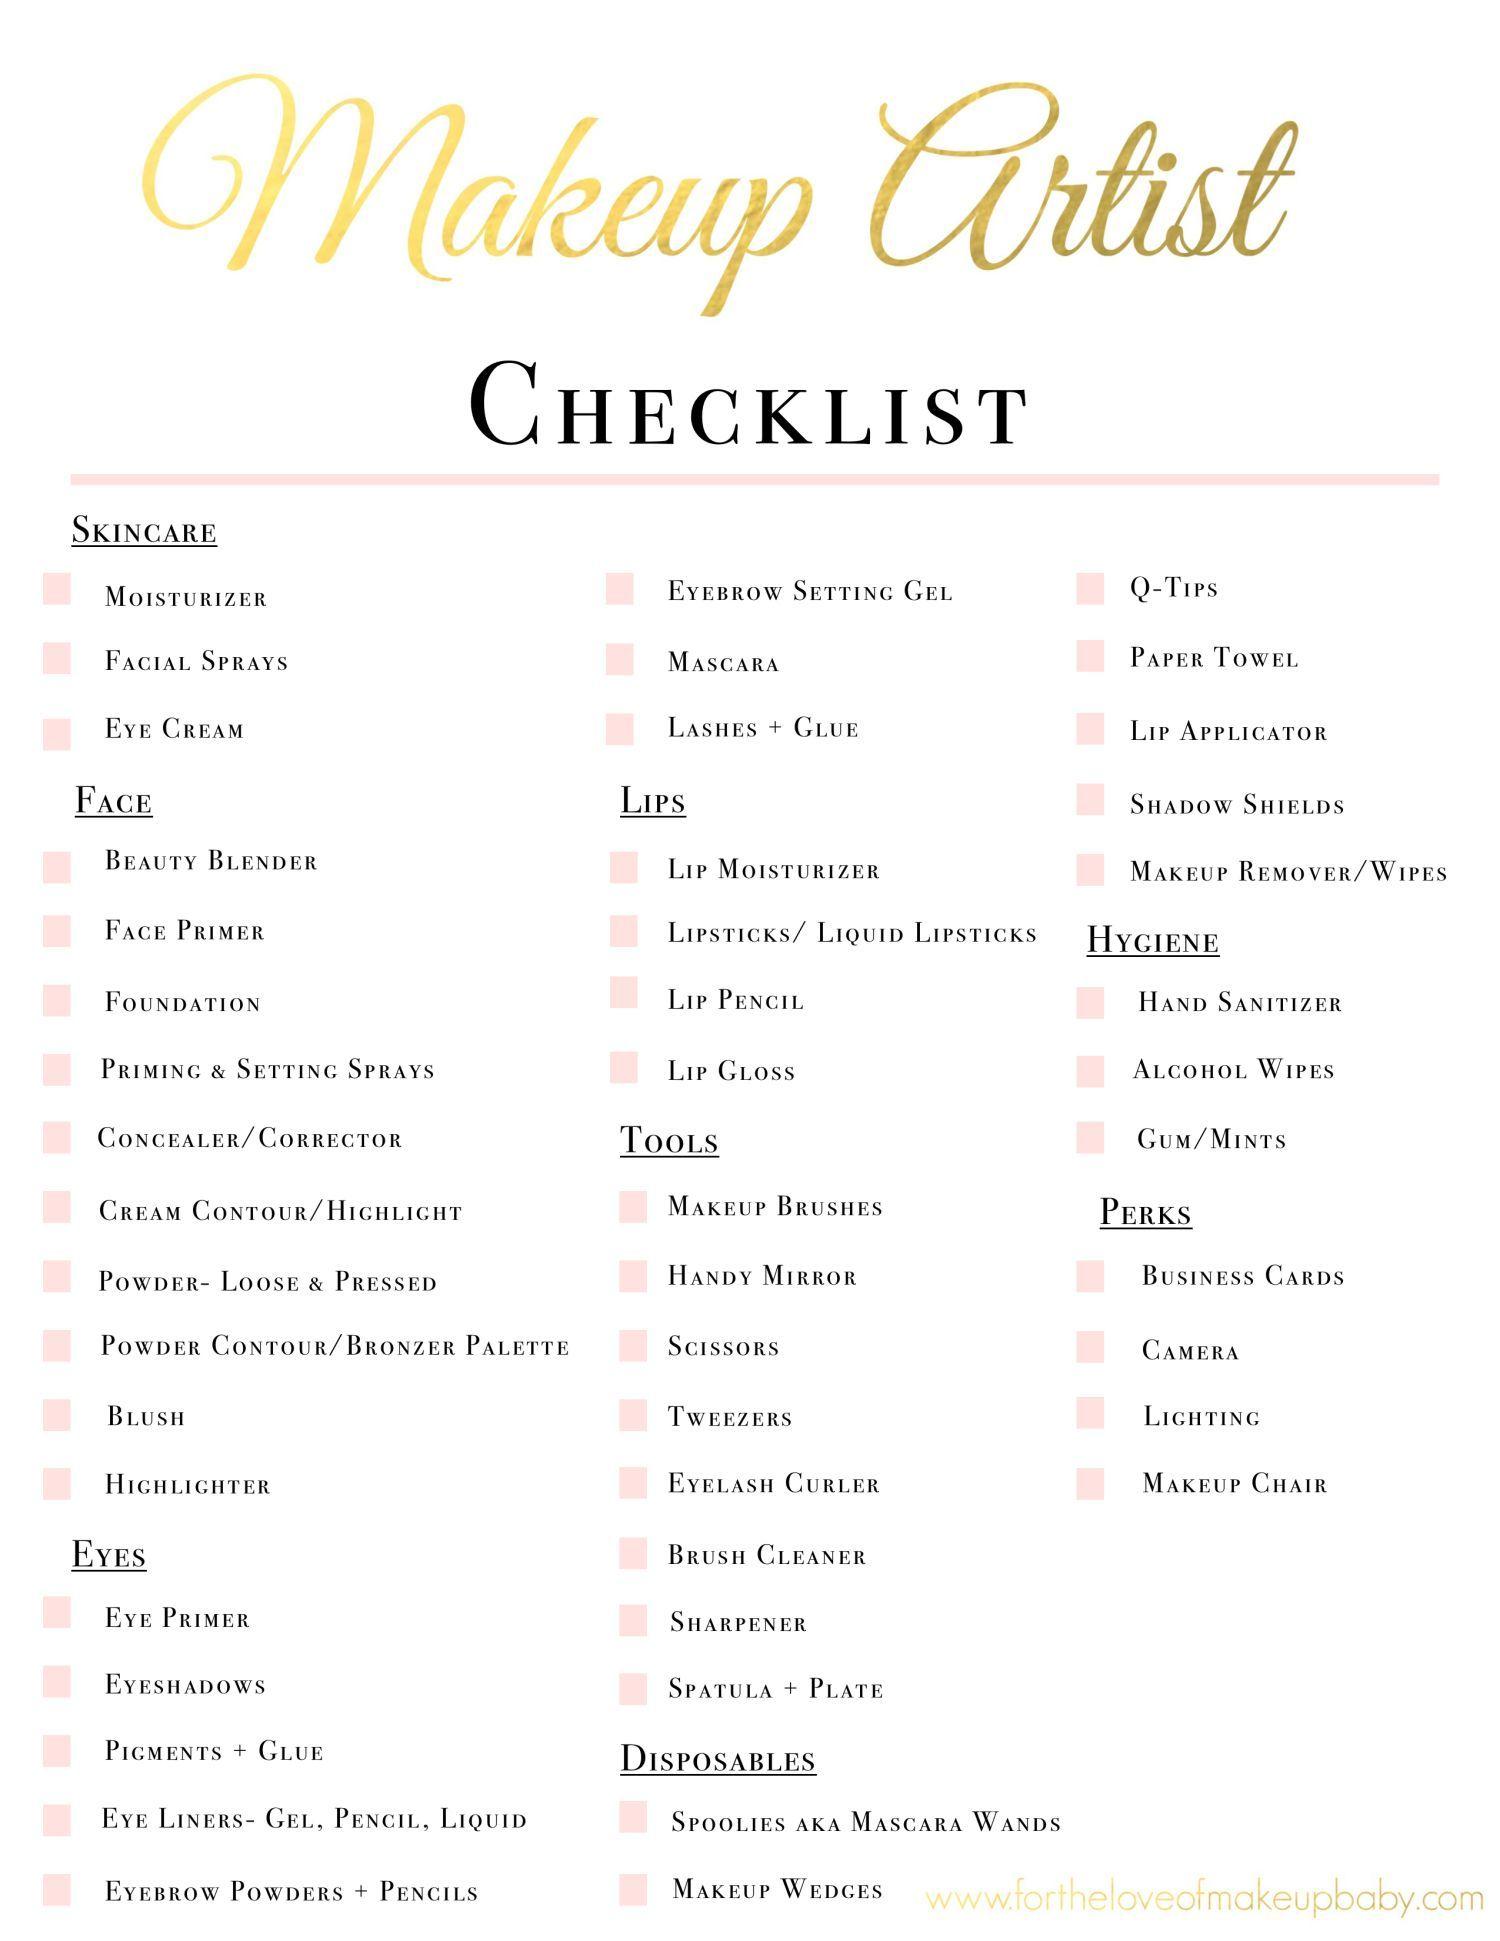 Makeup Artist Kit Checklist Makeupeasy Makeup Artist Kit Essentials Professional Makeup Kit Makeup Artist Tips